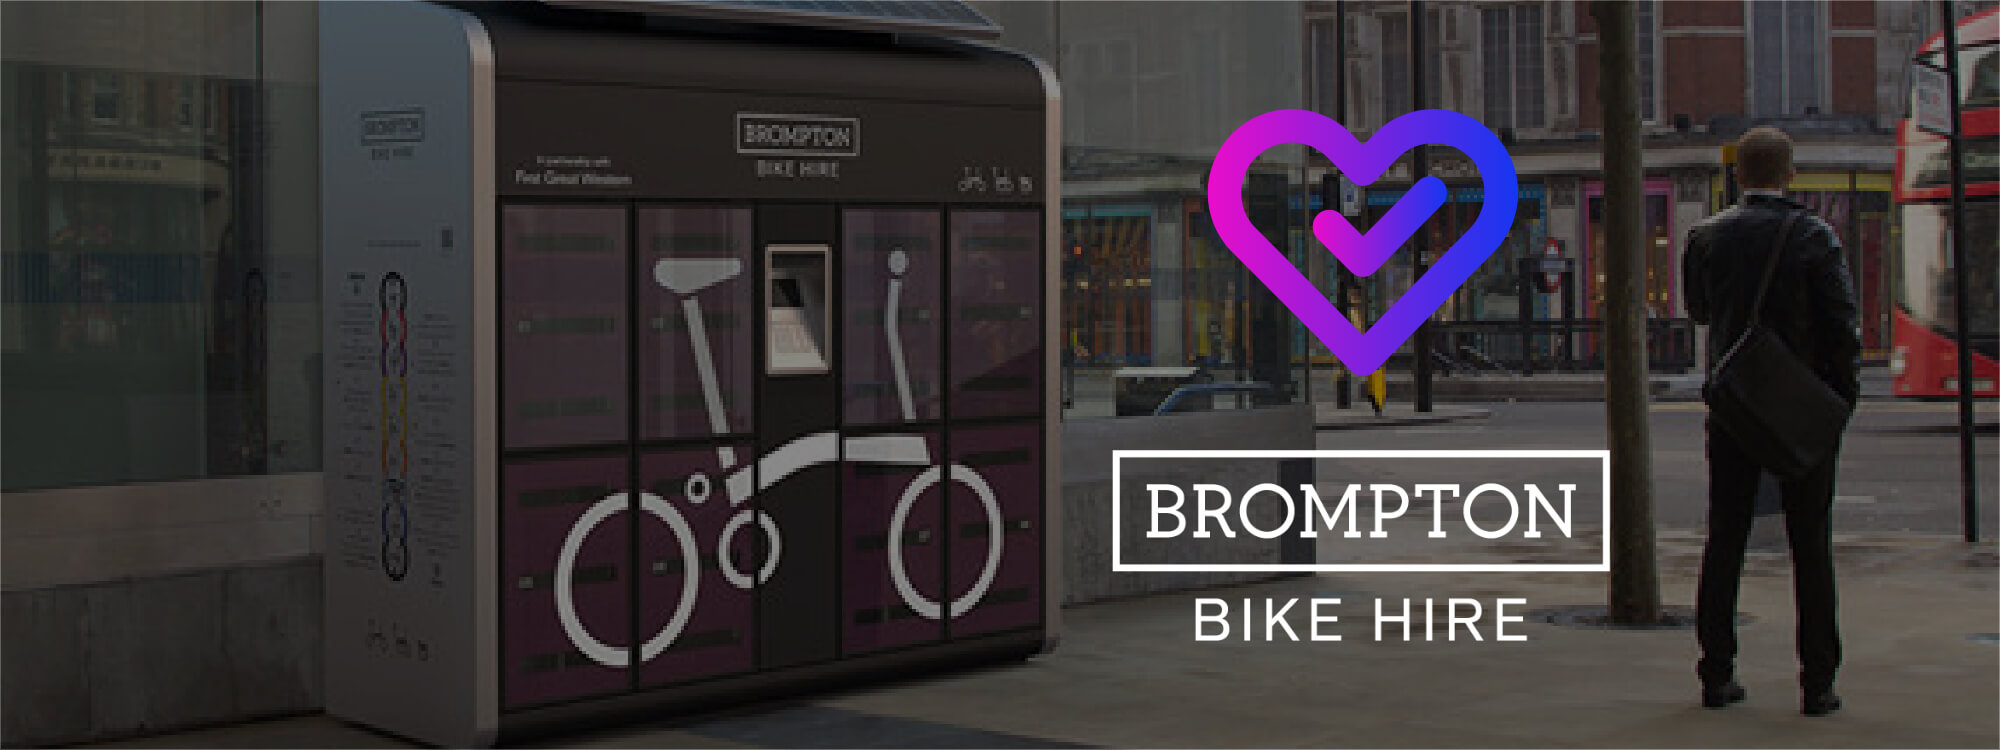 Zing Cover Welcomes Brompton Bike Hire